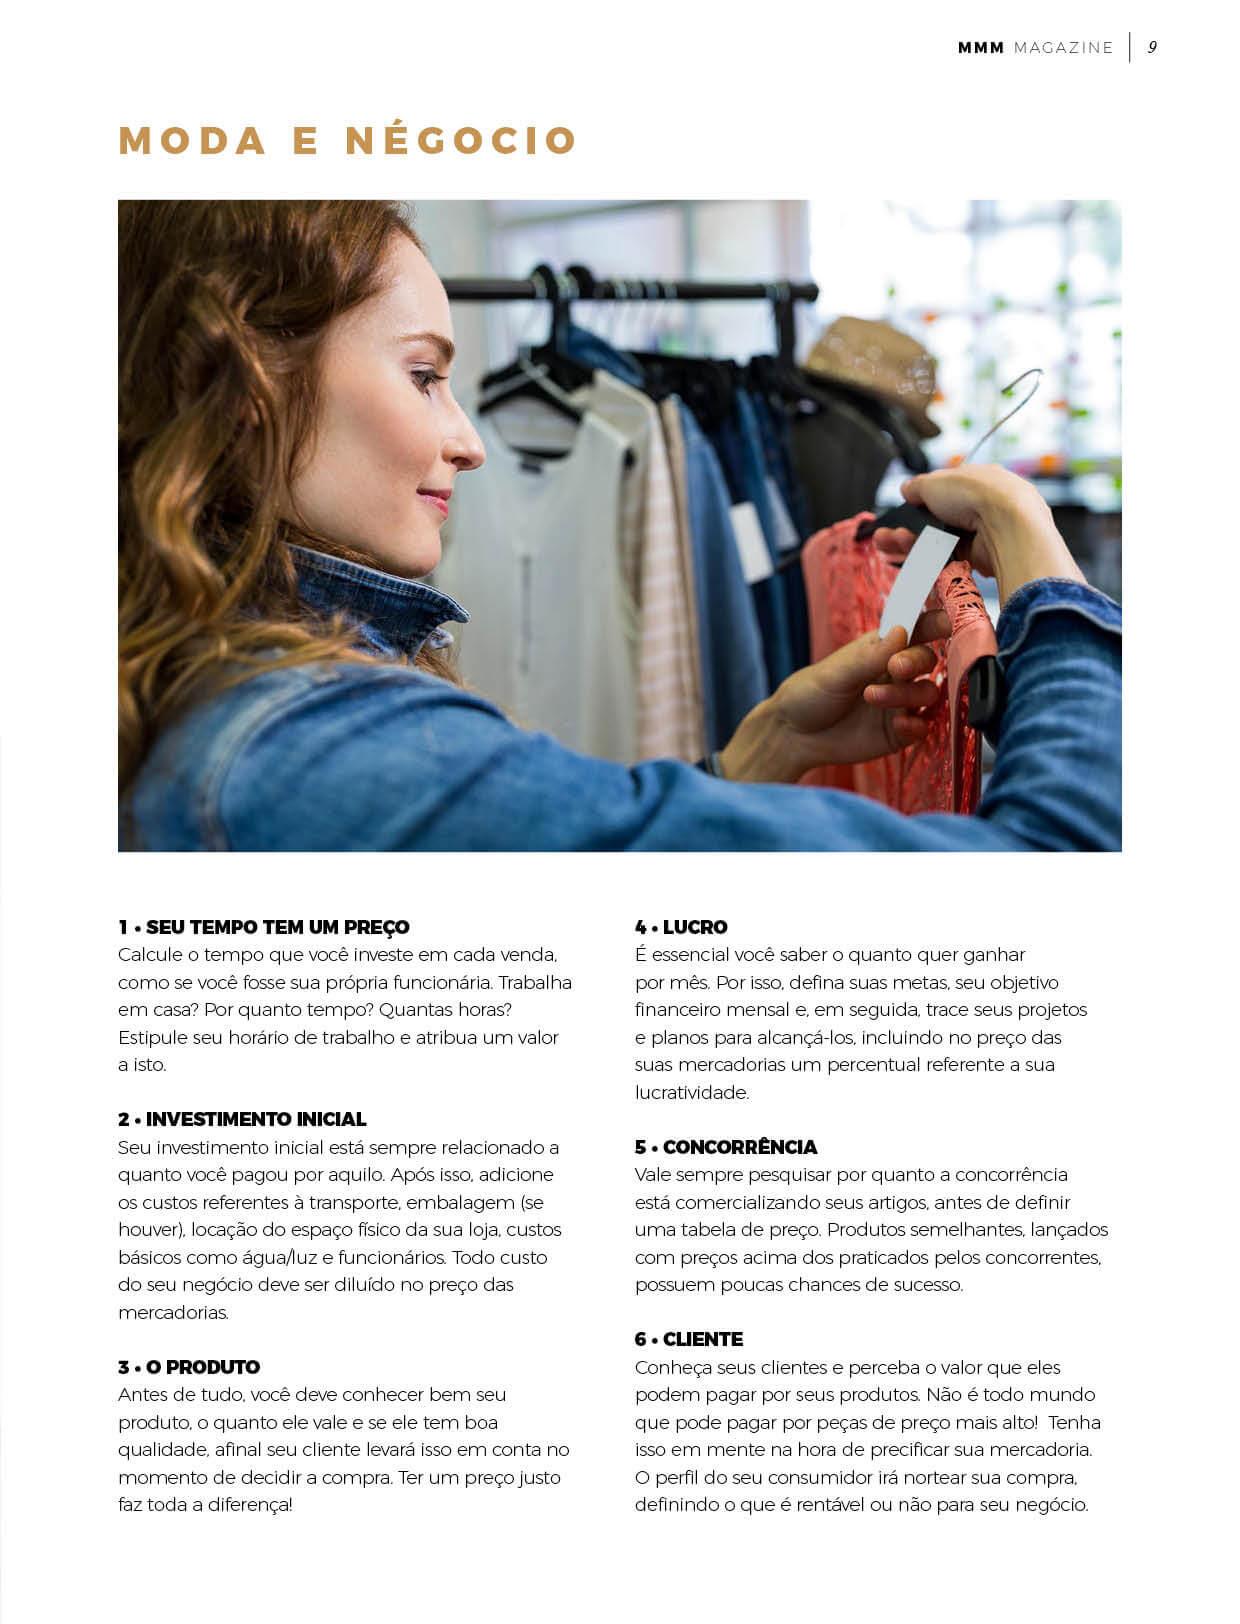 revista-mmmagazine-9